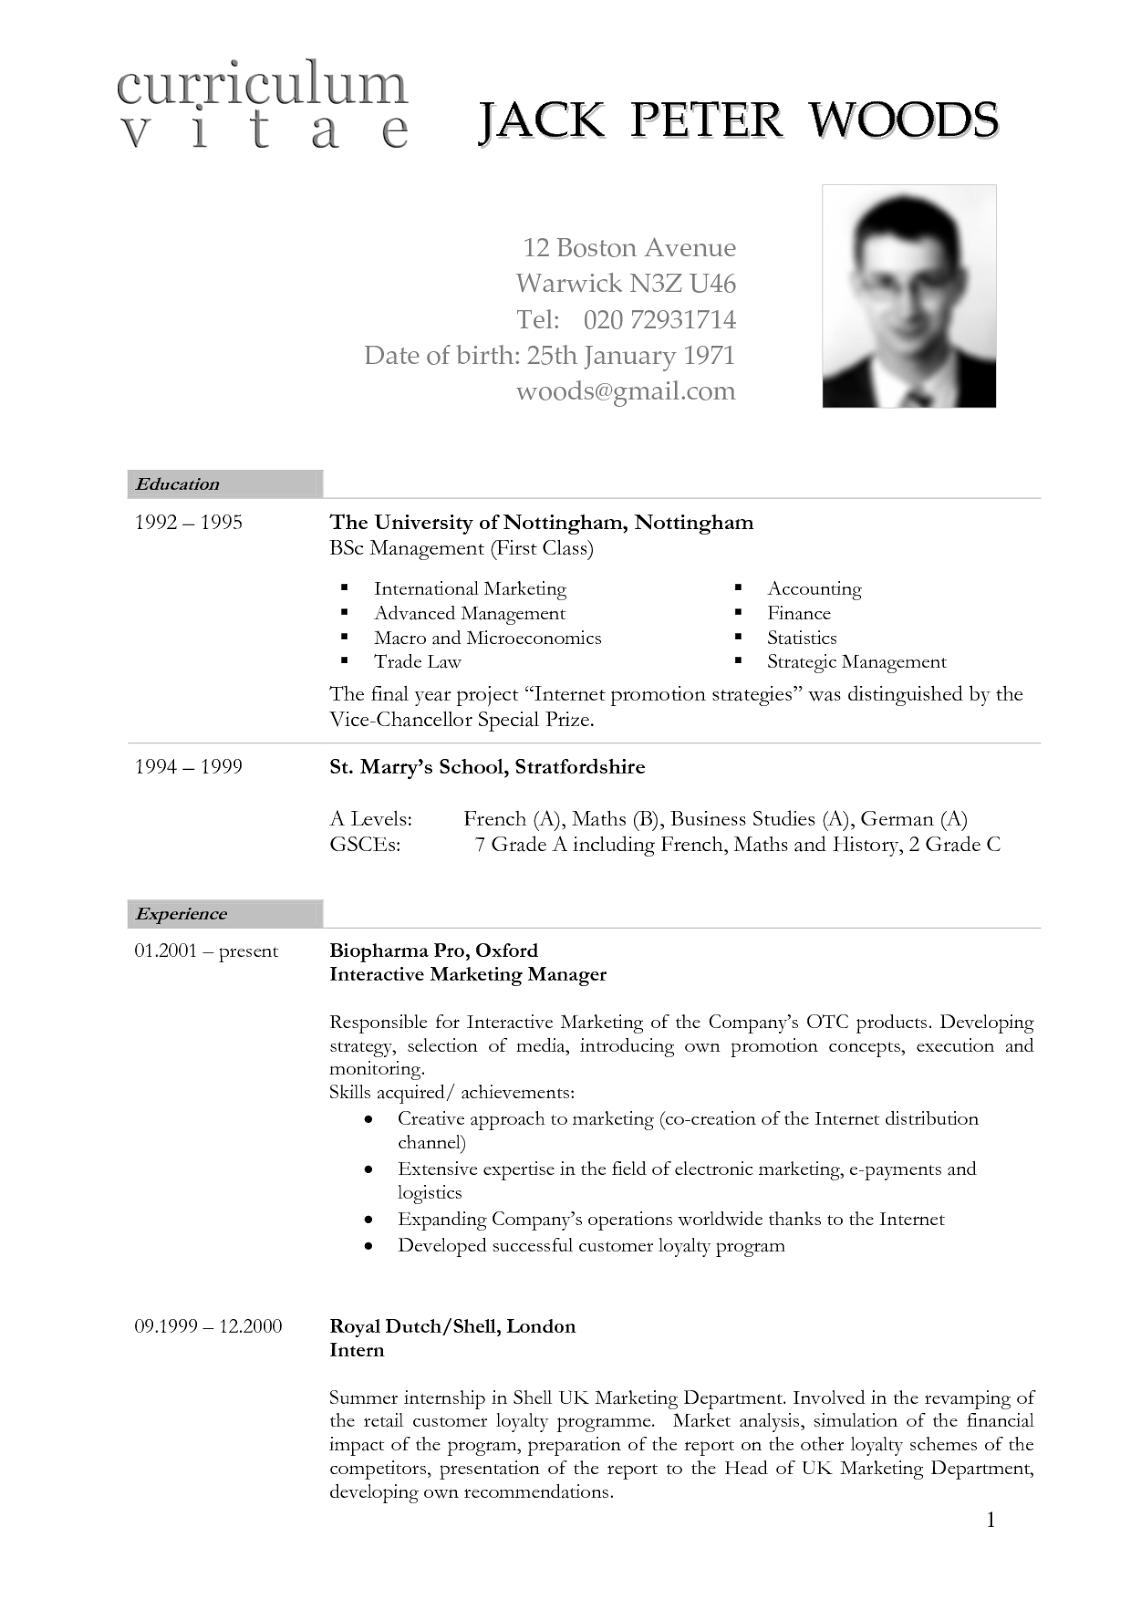 resume in american format